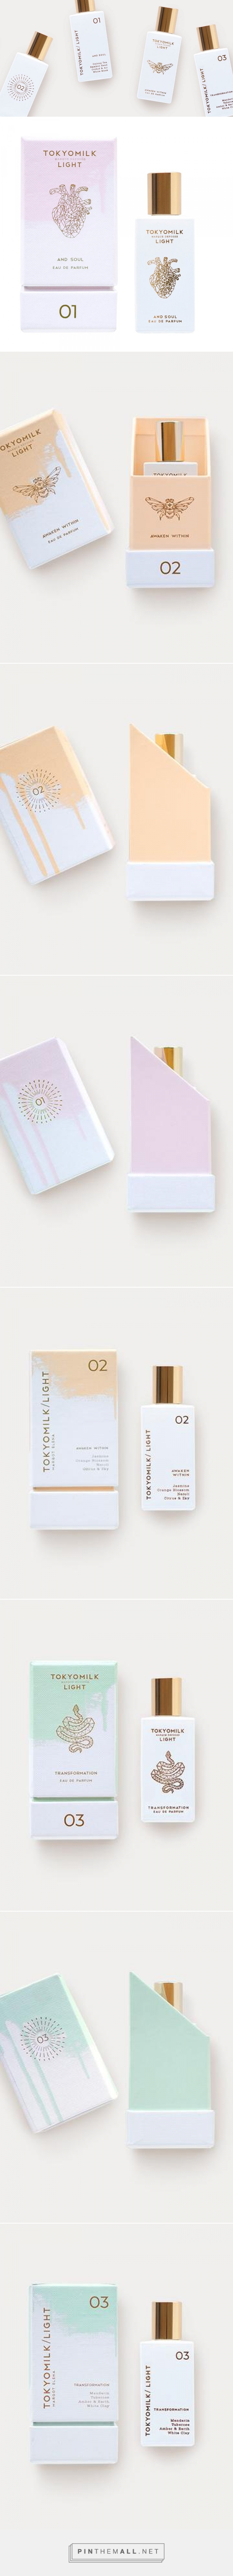 TokyoMilk Light — The Dieline - Branding & Packaging Design - created via https://pinthemall.net